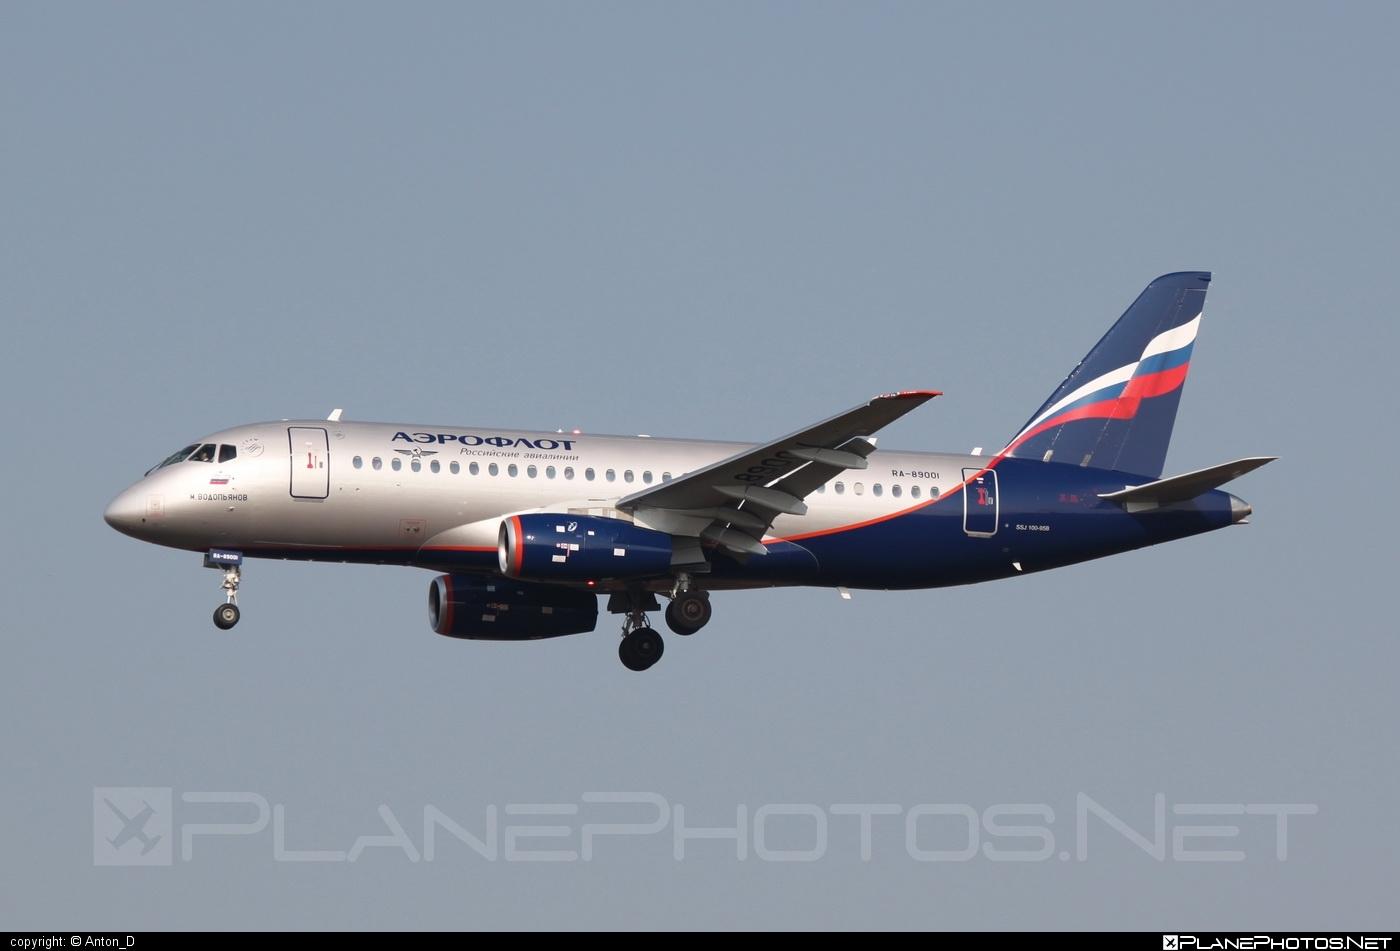 Sukhoi SSJ 100-95B Superjet - RA-89001 operated by Aeroflot #aeroflot #ssj100 #ssj10095b #sukhoi #sukhoisuperjet #superjet